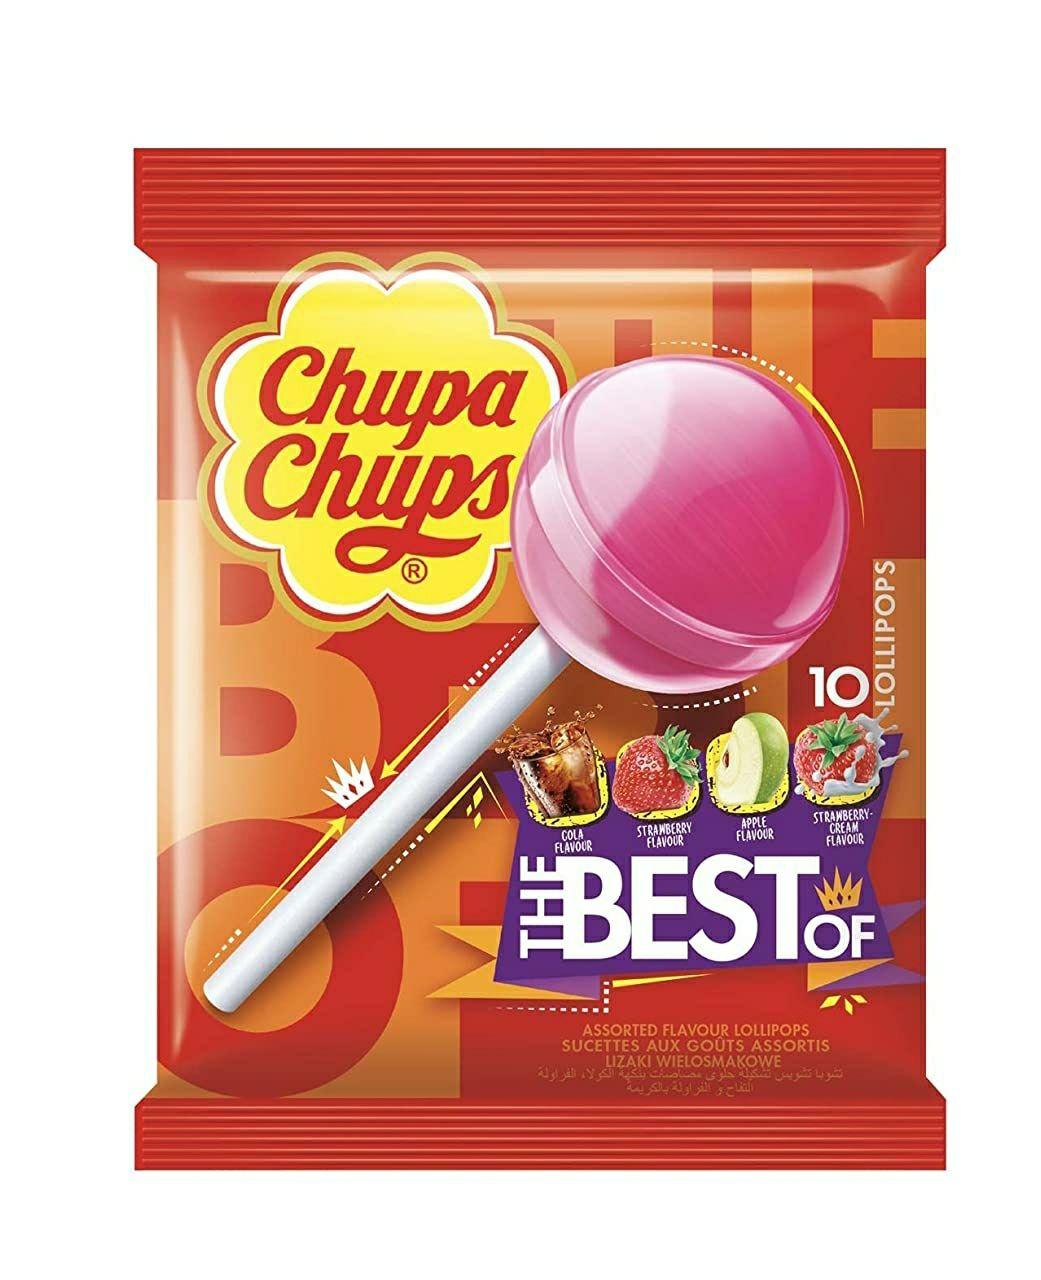 Chupa Chups - Lollipops - Caramelos - 10 caramelos